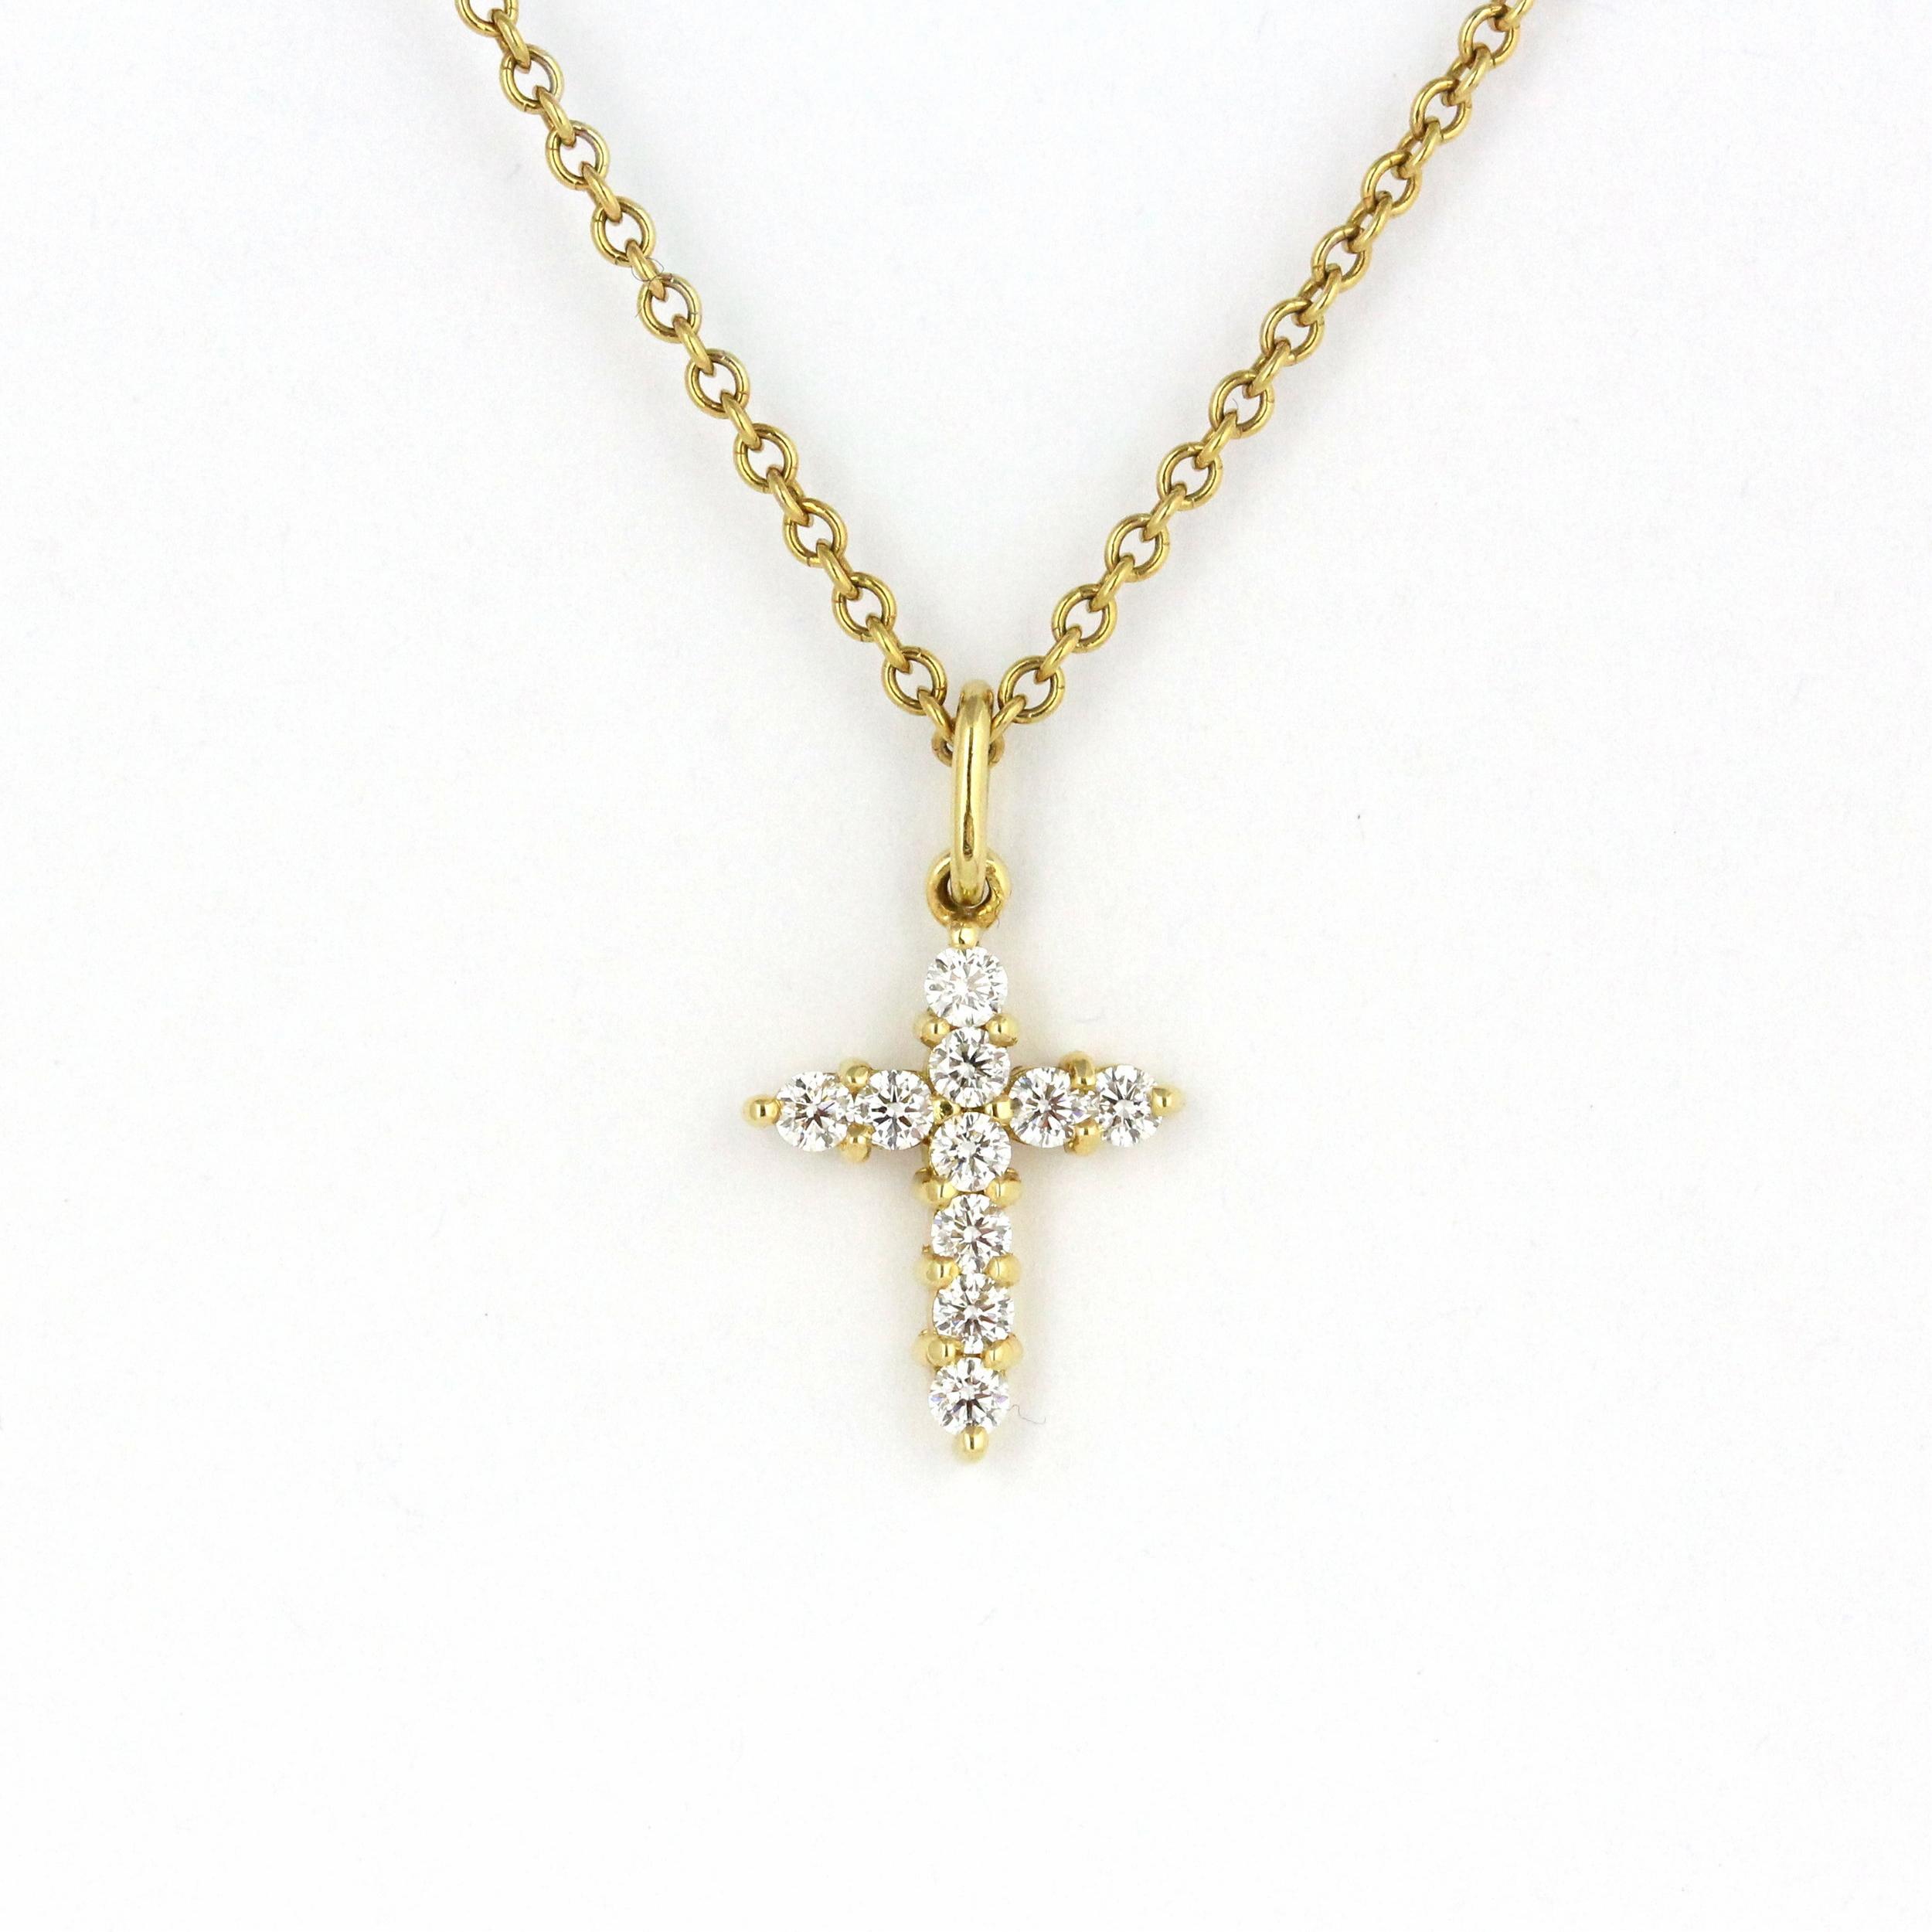 Yellow gold cross pendant set with diamonds.